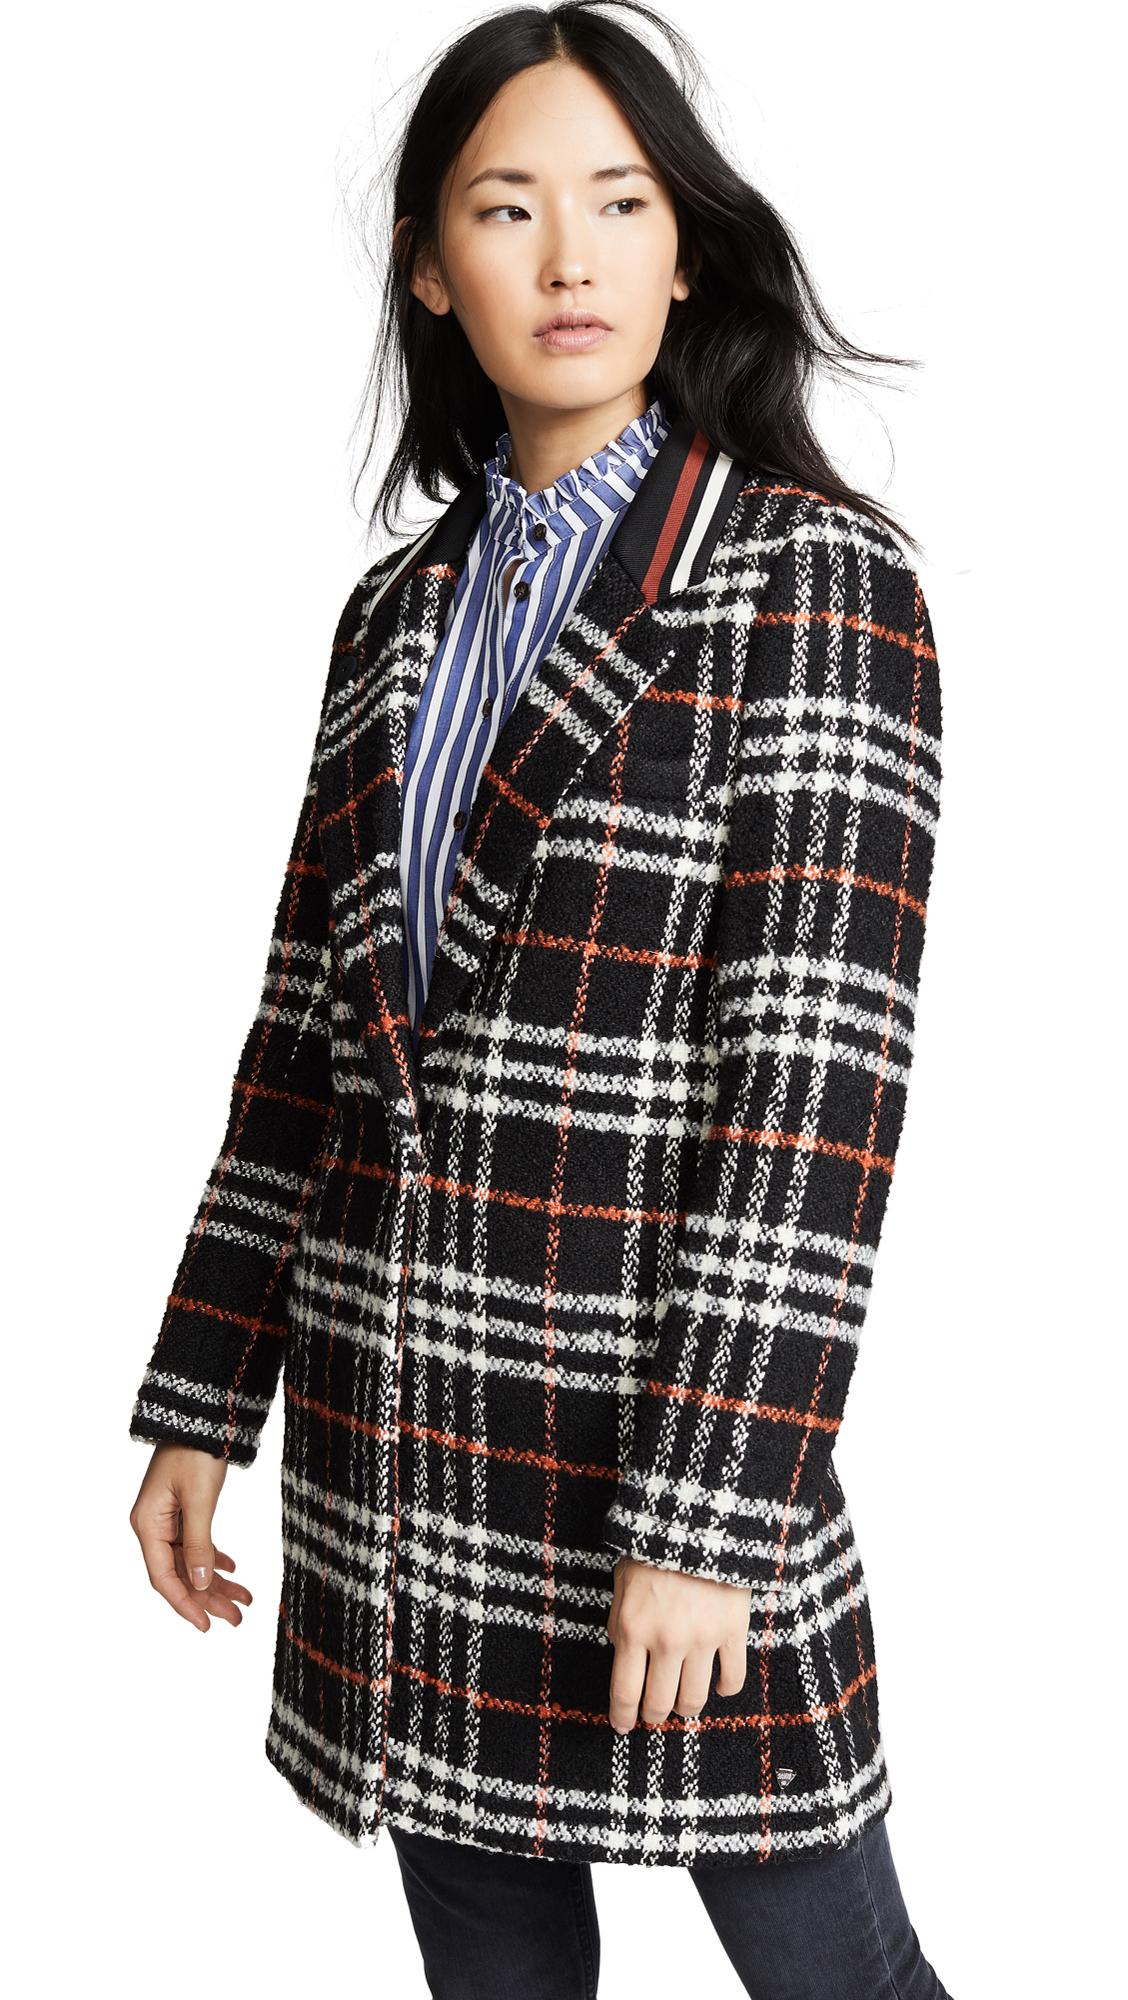 SCOTCH & SODA/MAISON SCOTCH Bonded Wool Jacket in Combo C